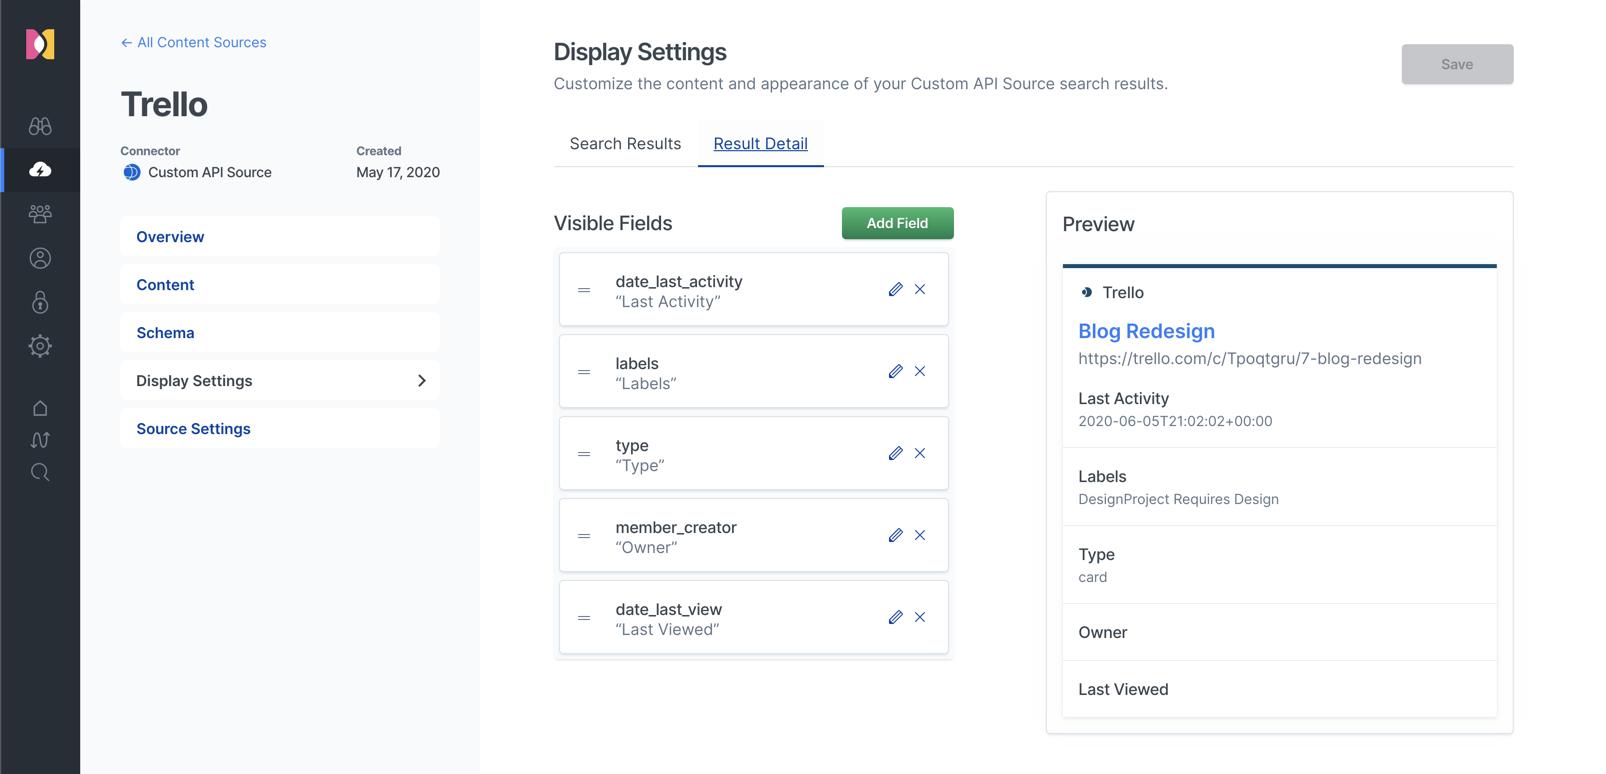 Adjusting search result display settings